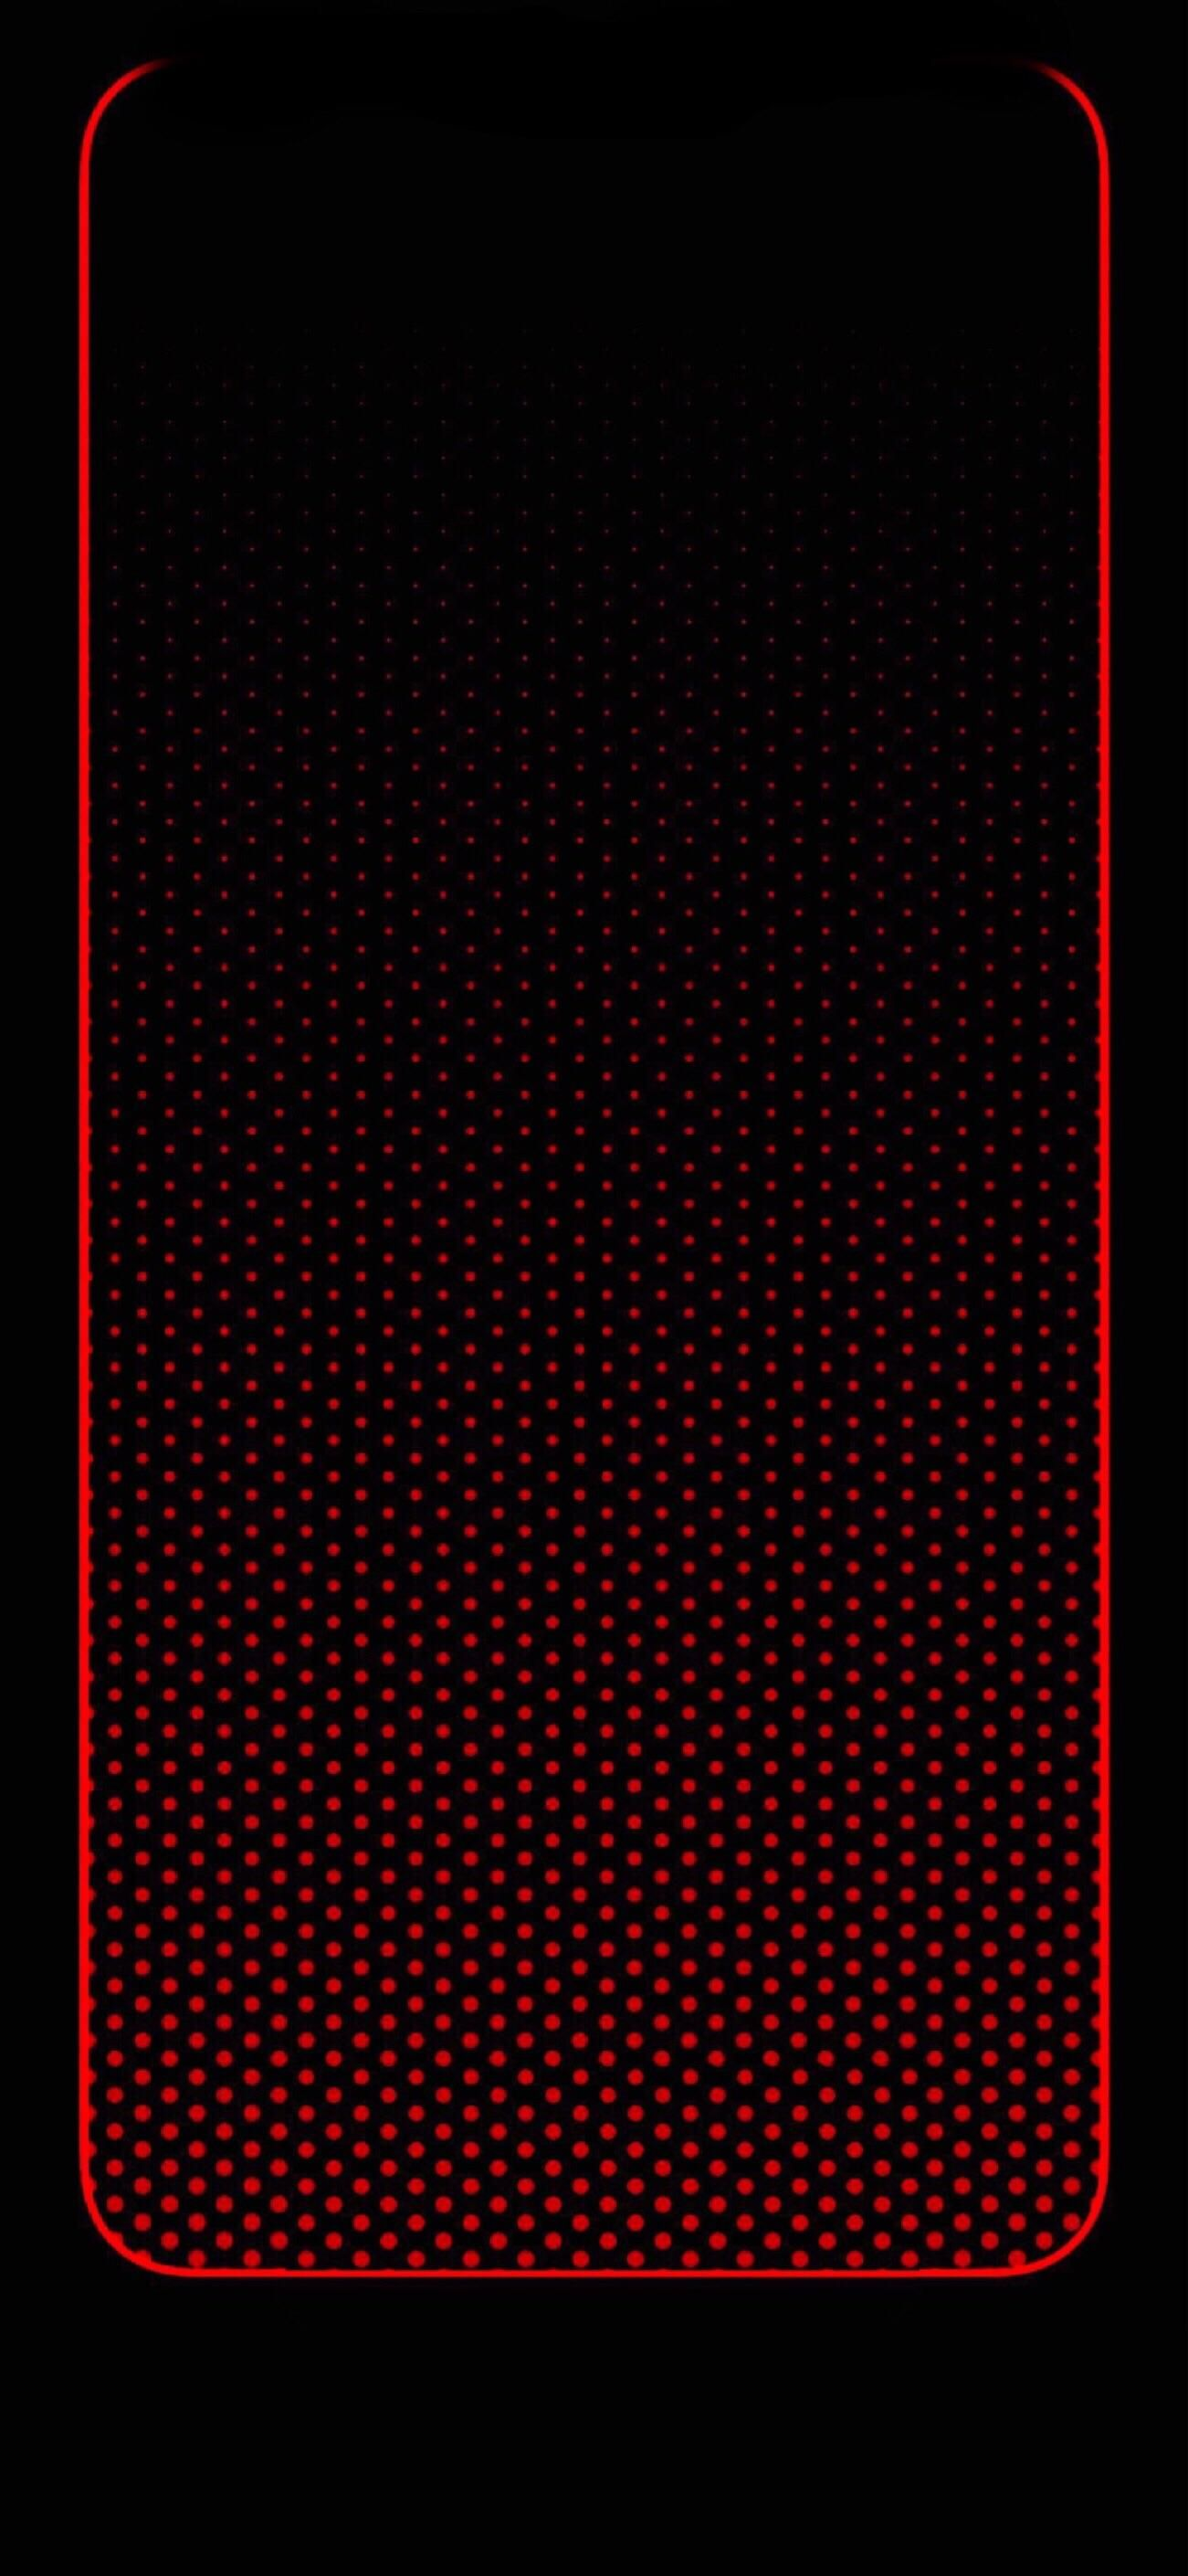 Iphone x oled wallpaper